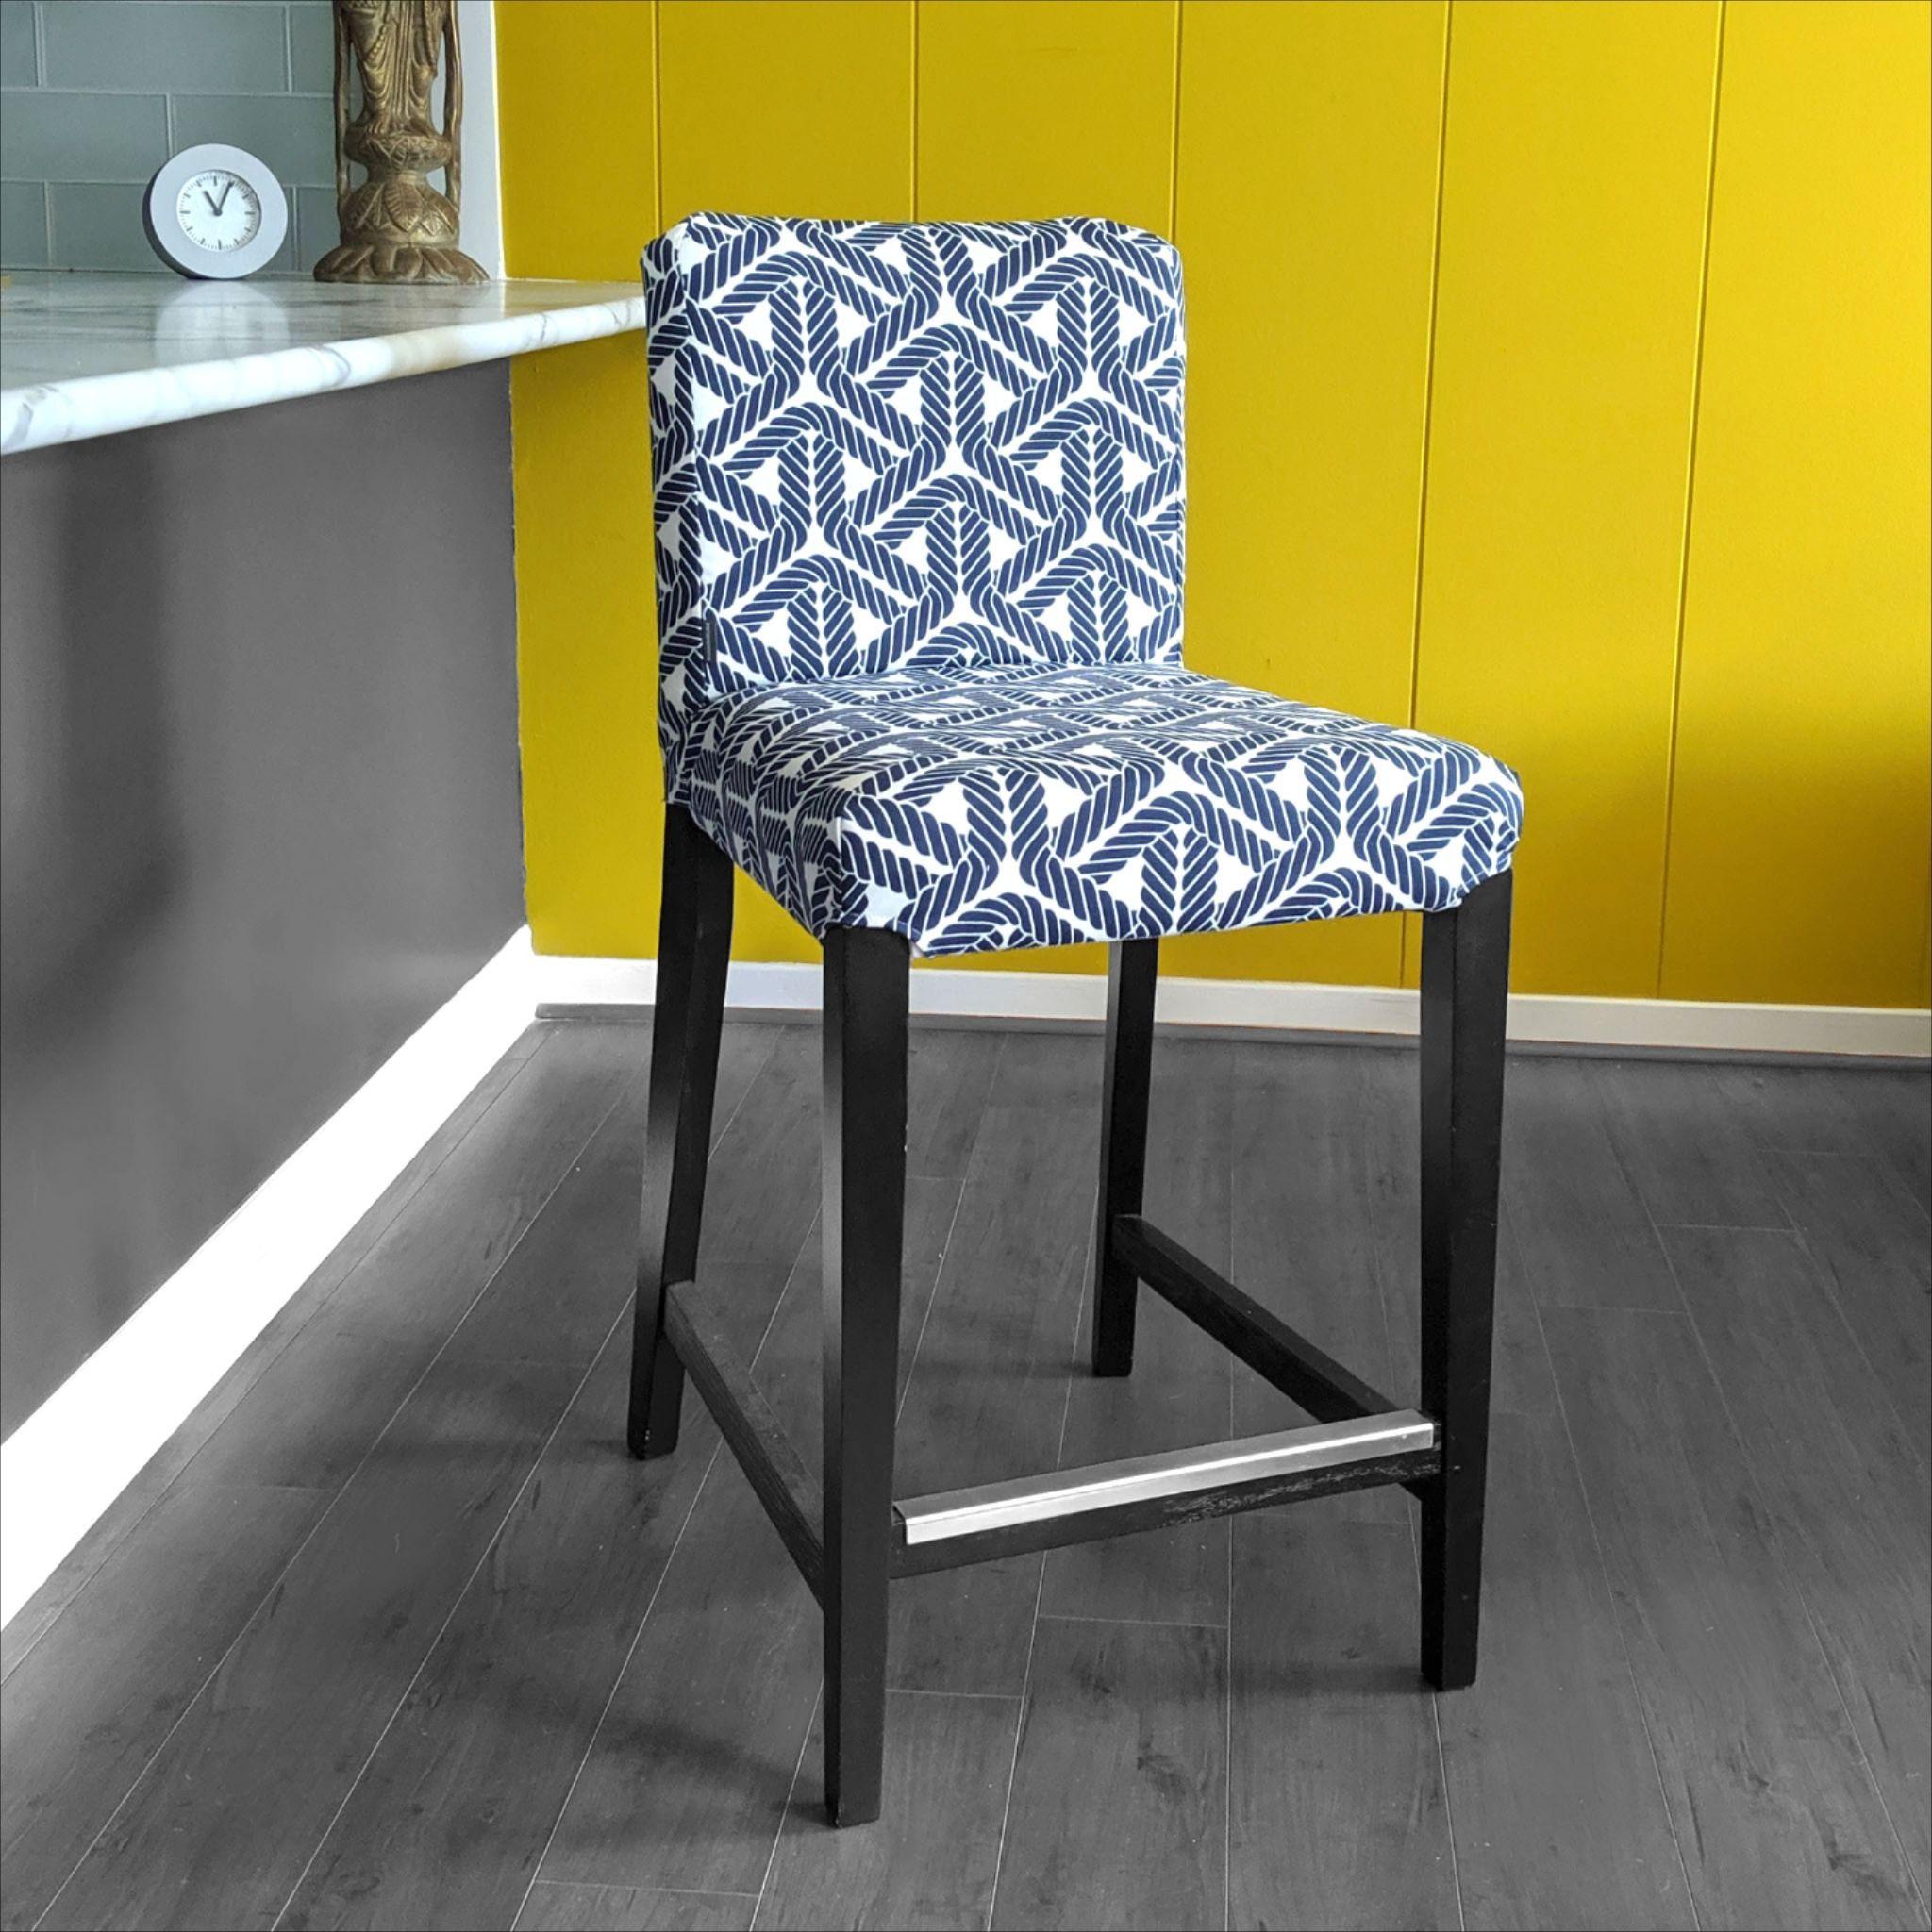 IKEA HENRIKSDAL Bar Stool Chair Cover